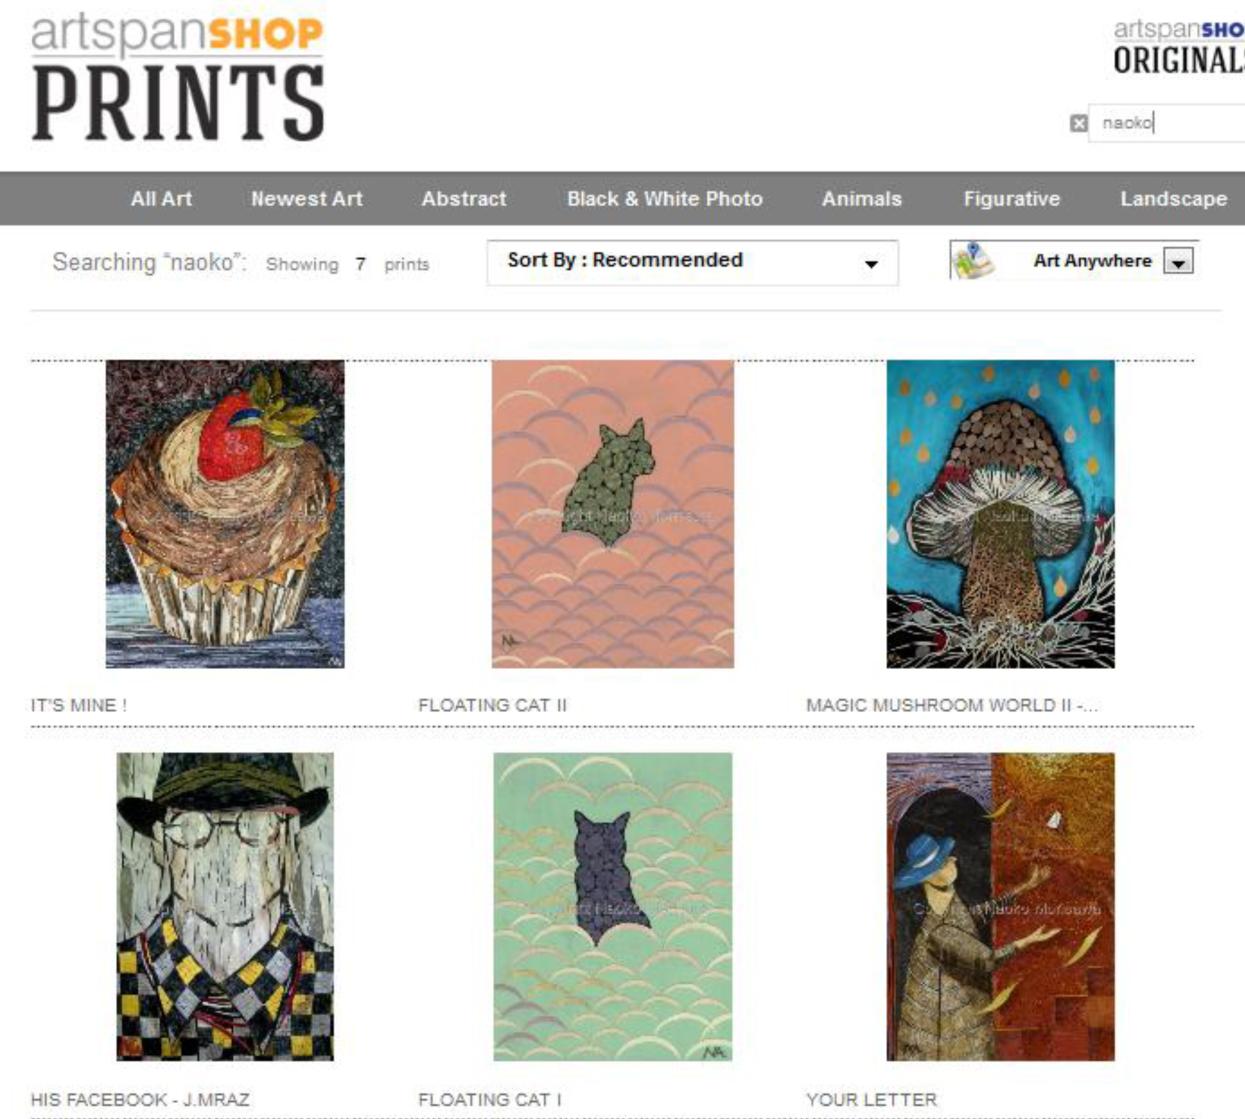 Artspanshop Prints on sale